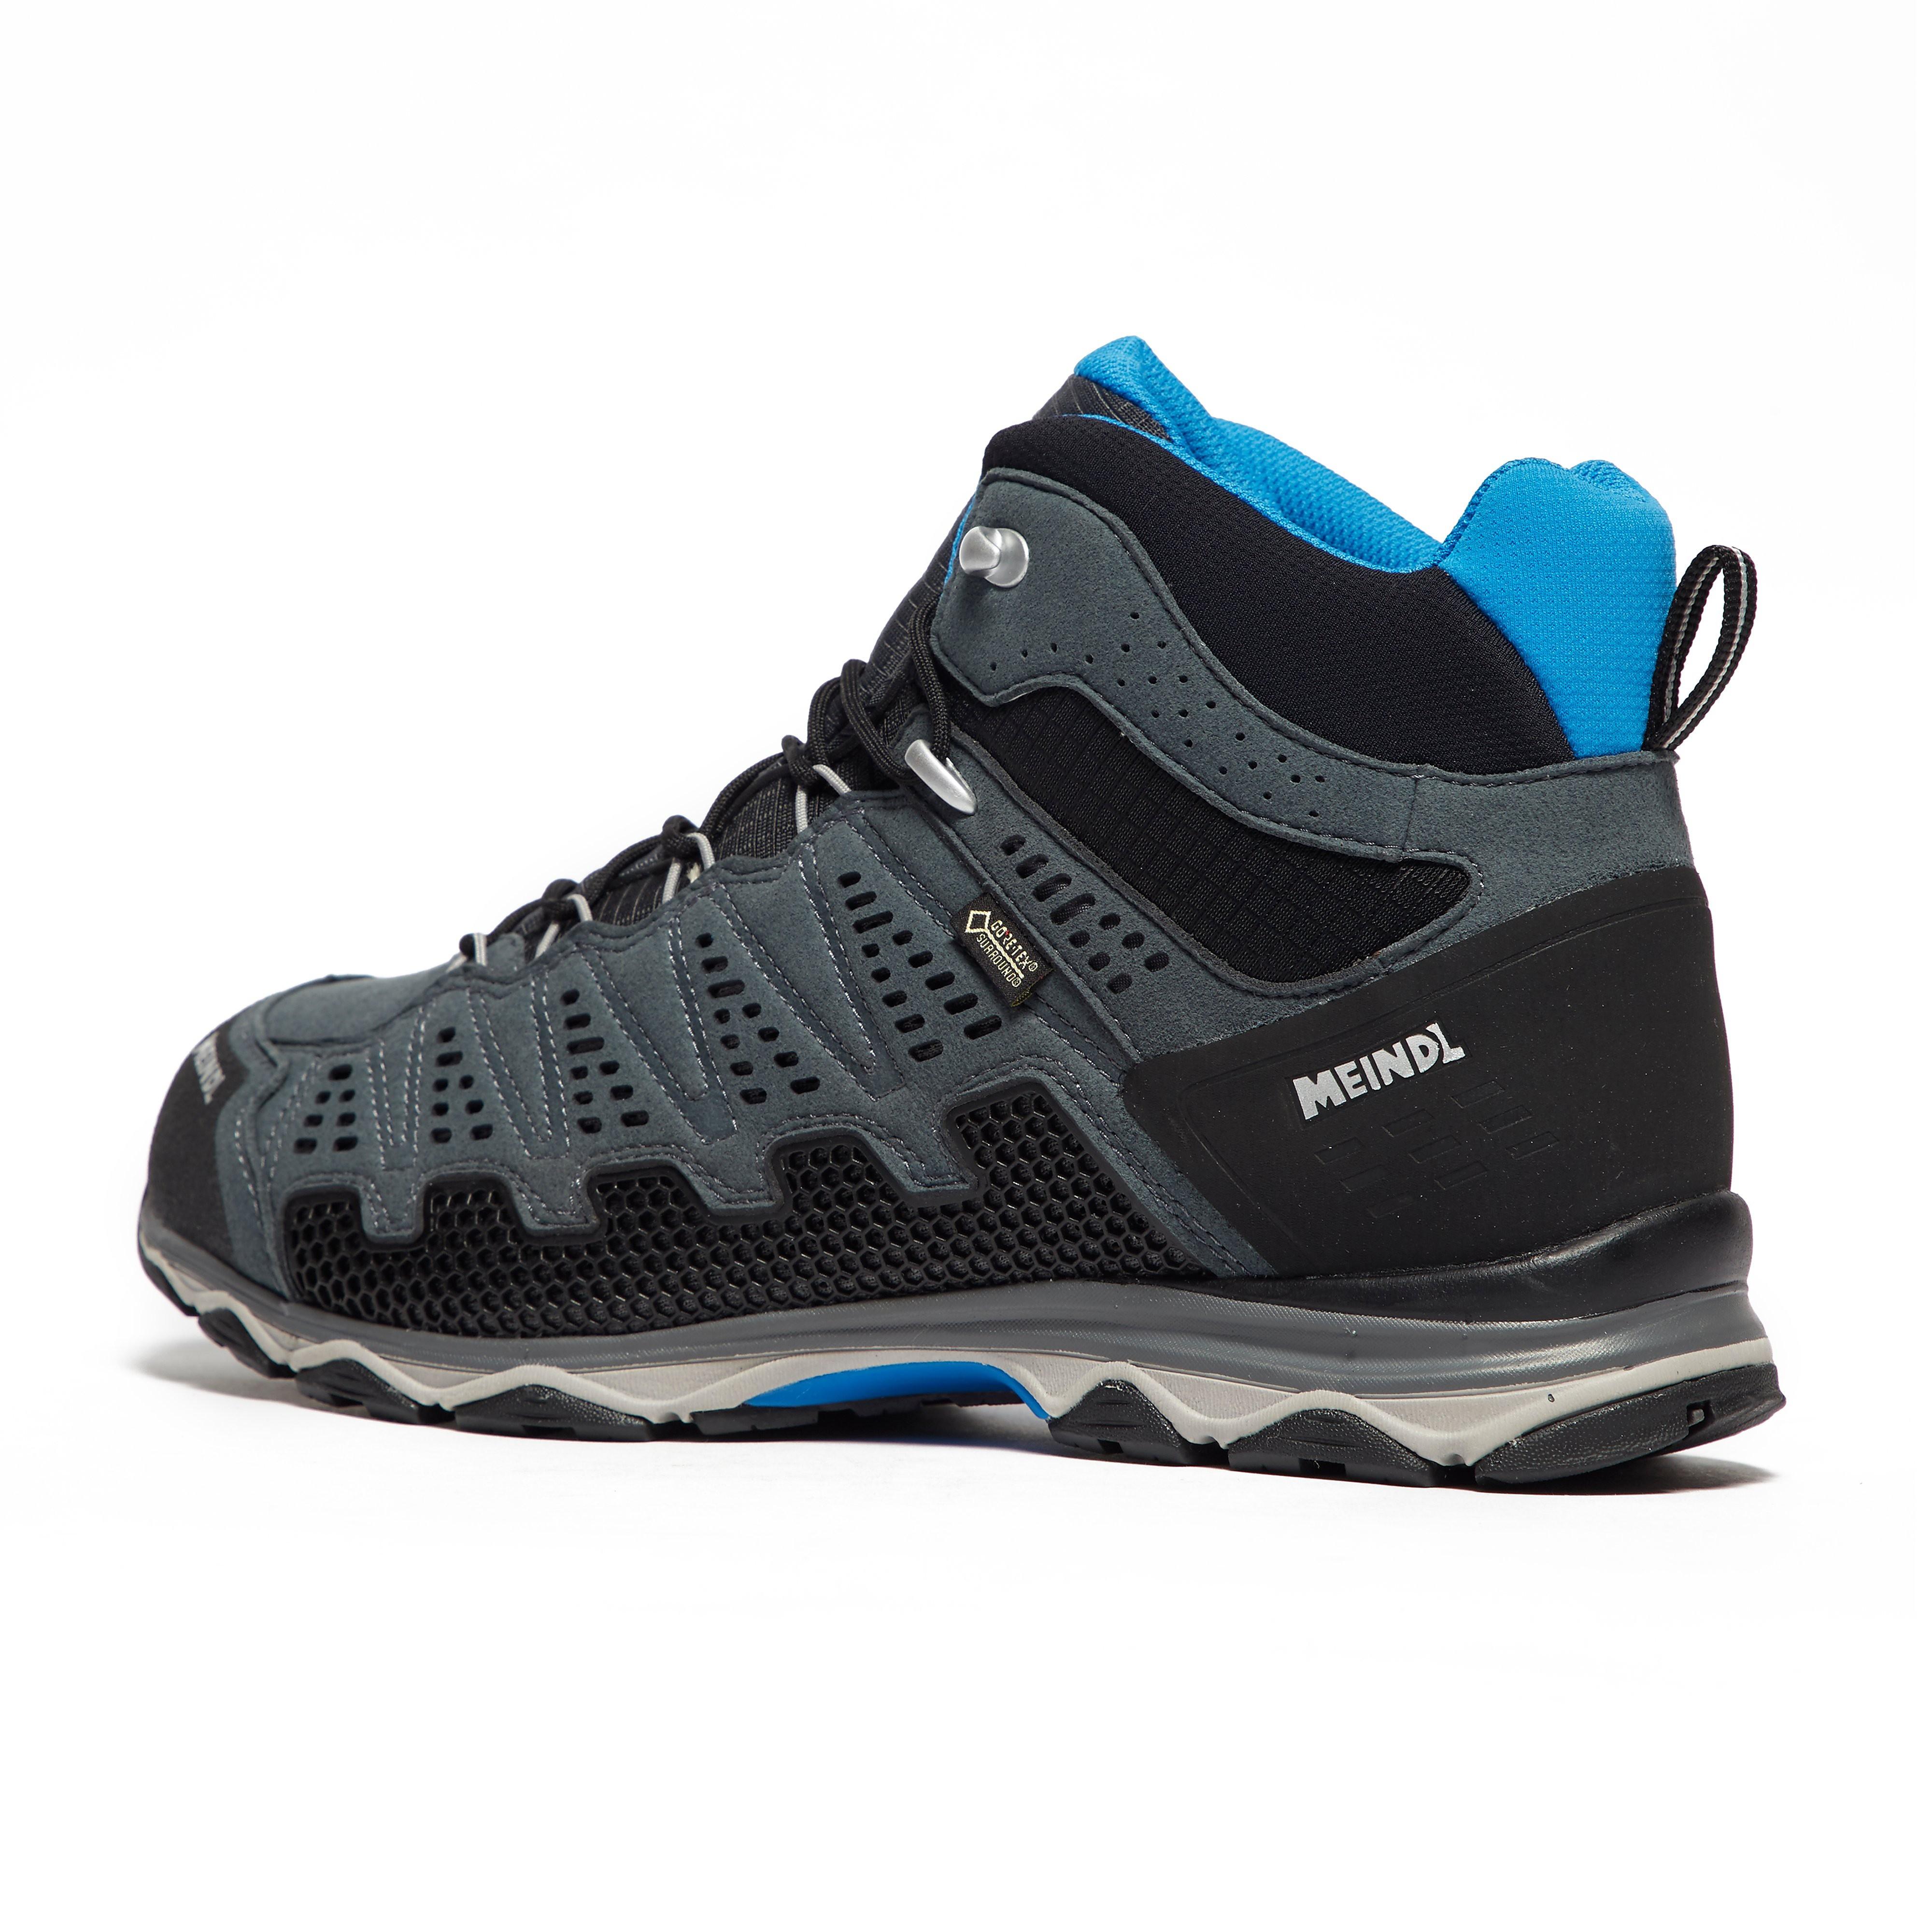 Meindl X-SO 70 Mid GTX Men's Hiking Shoe